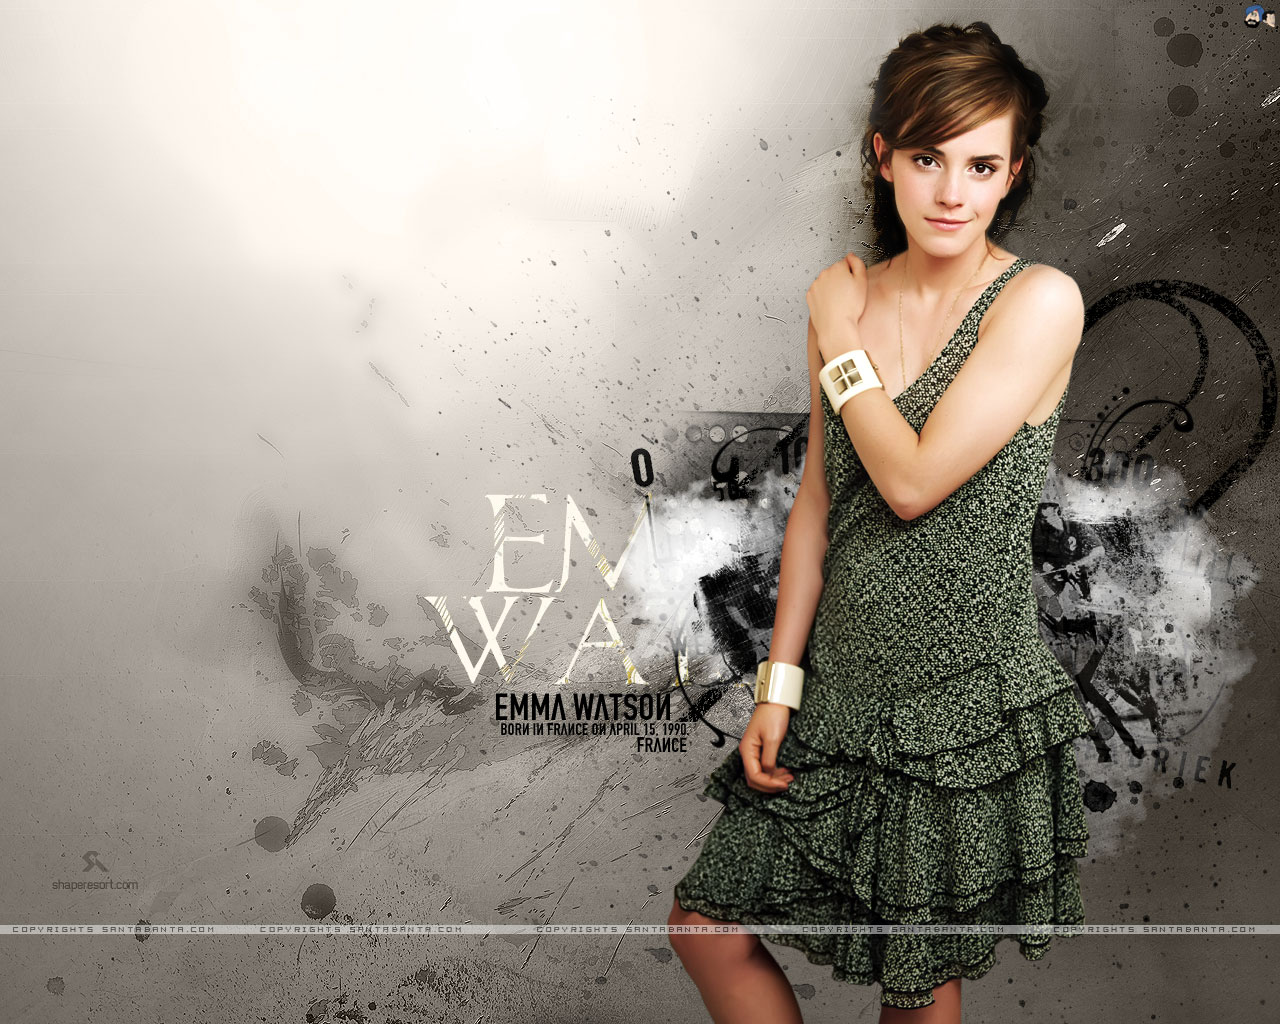 Wallpaper: Emma Watson Sexy Wallpapers